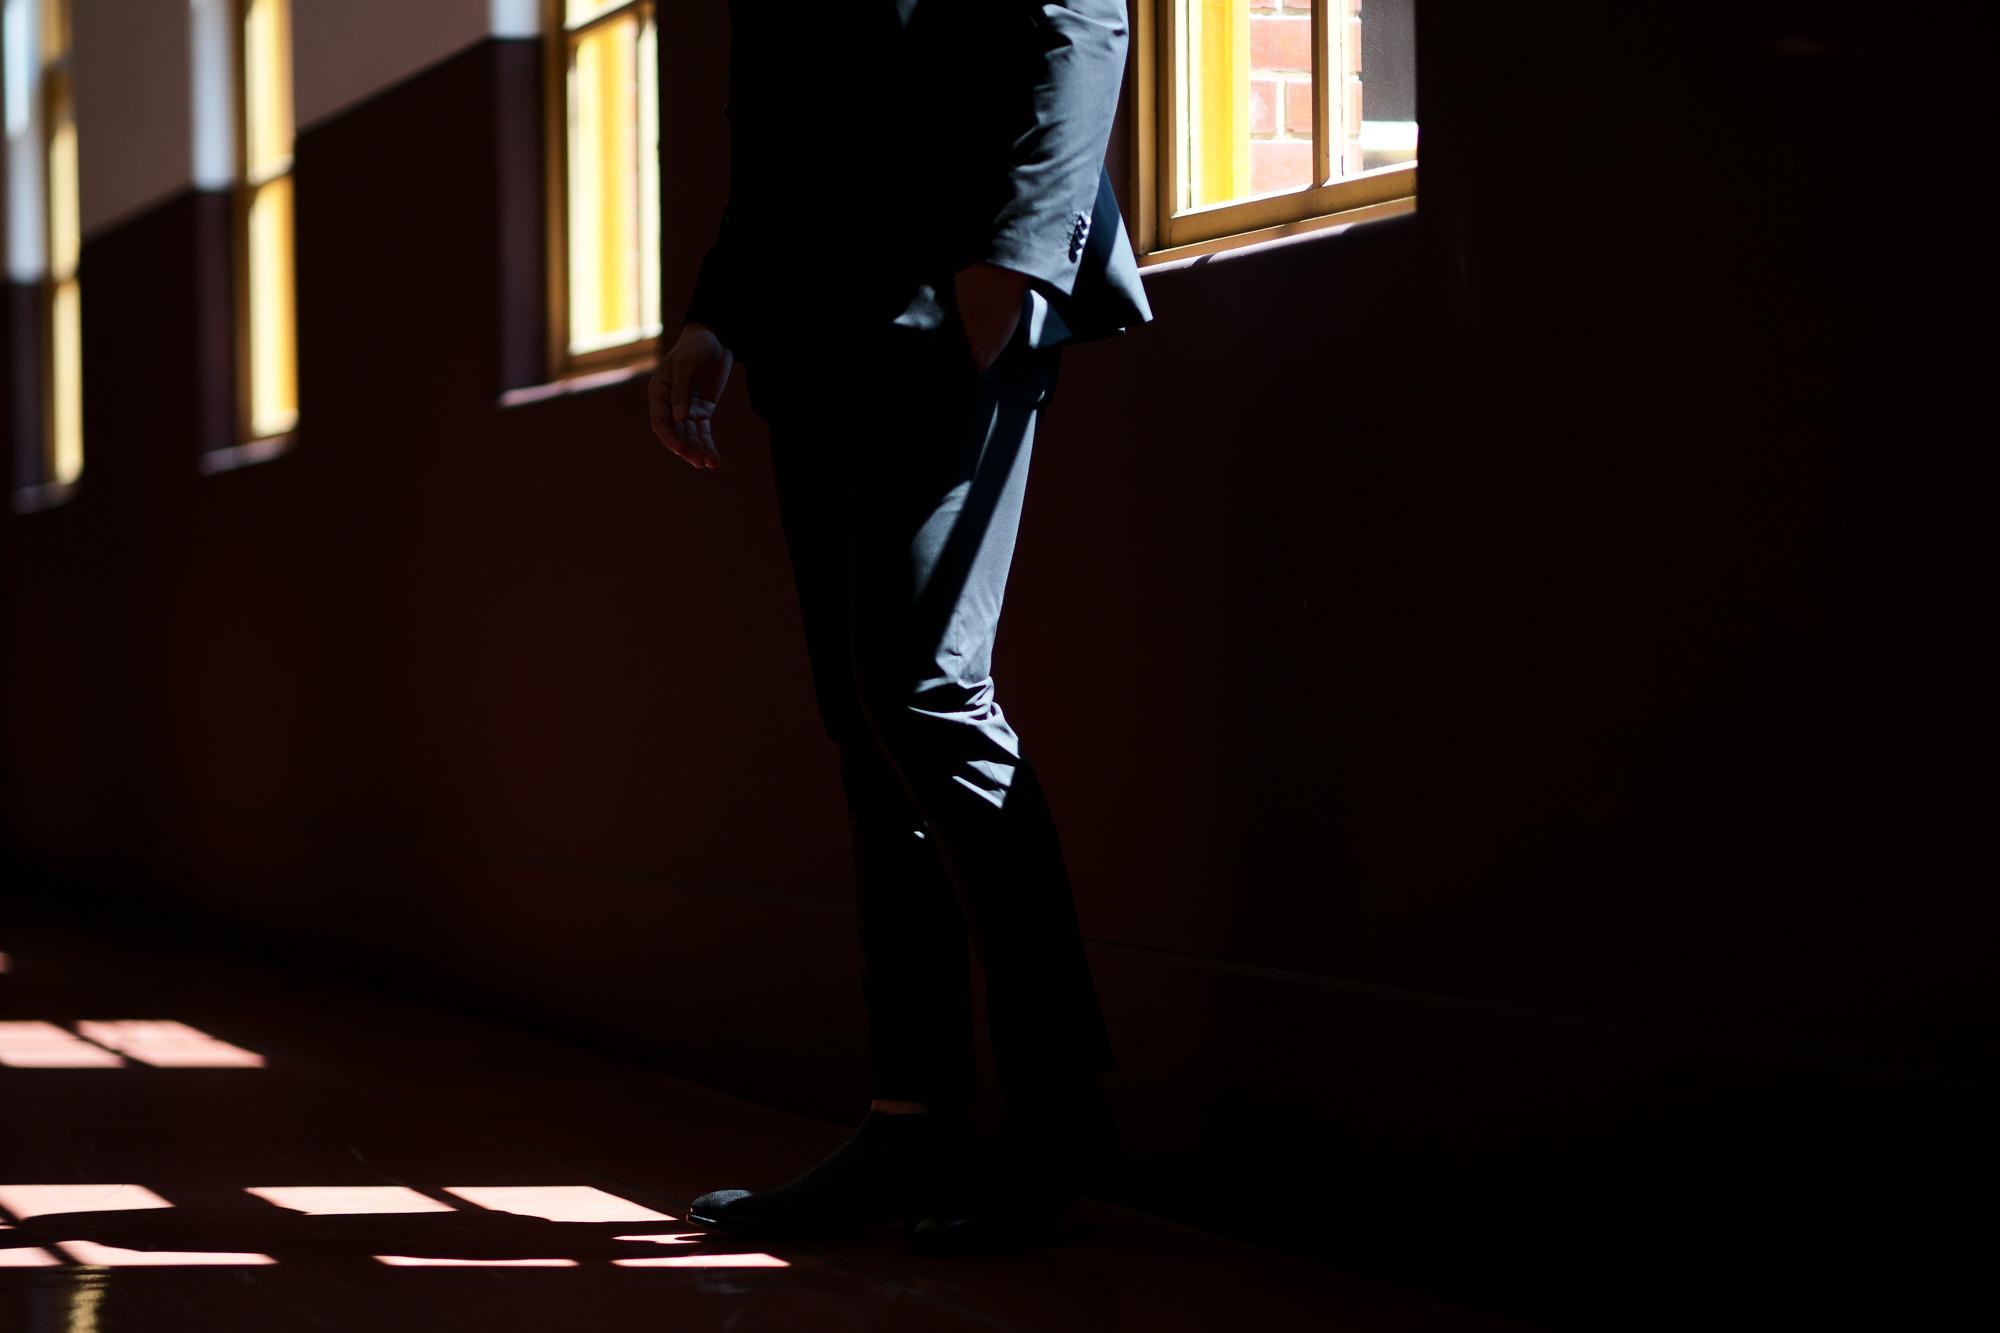 Cuervo (クエルボ) Sartoria Collection (サルトリア コレクション) Rooster (ルースター) STRETCH NYLON ストレッチナイロン スーツ BLACK(ブラック) MADE IN JAPAN (日本製) 2019 春夏 愛知 名古屋 alto e diritto altoediritto アルトエデリット